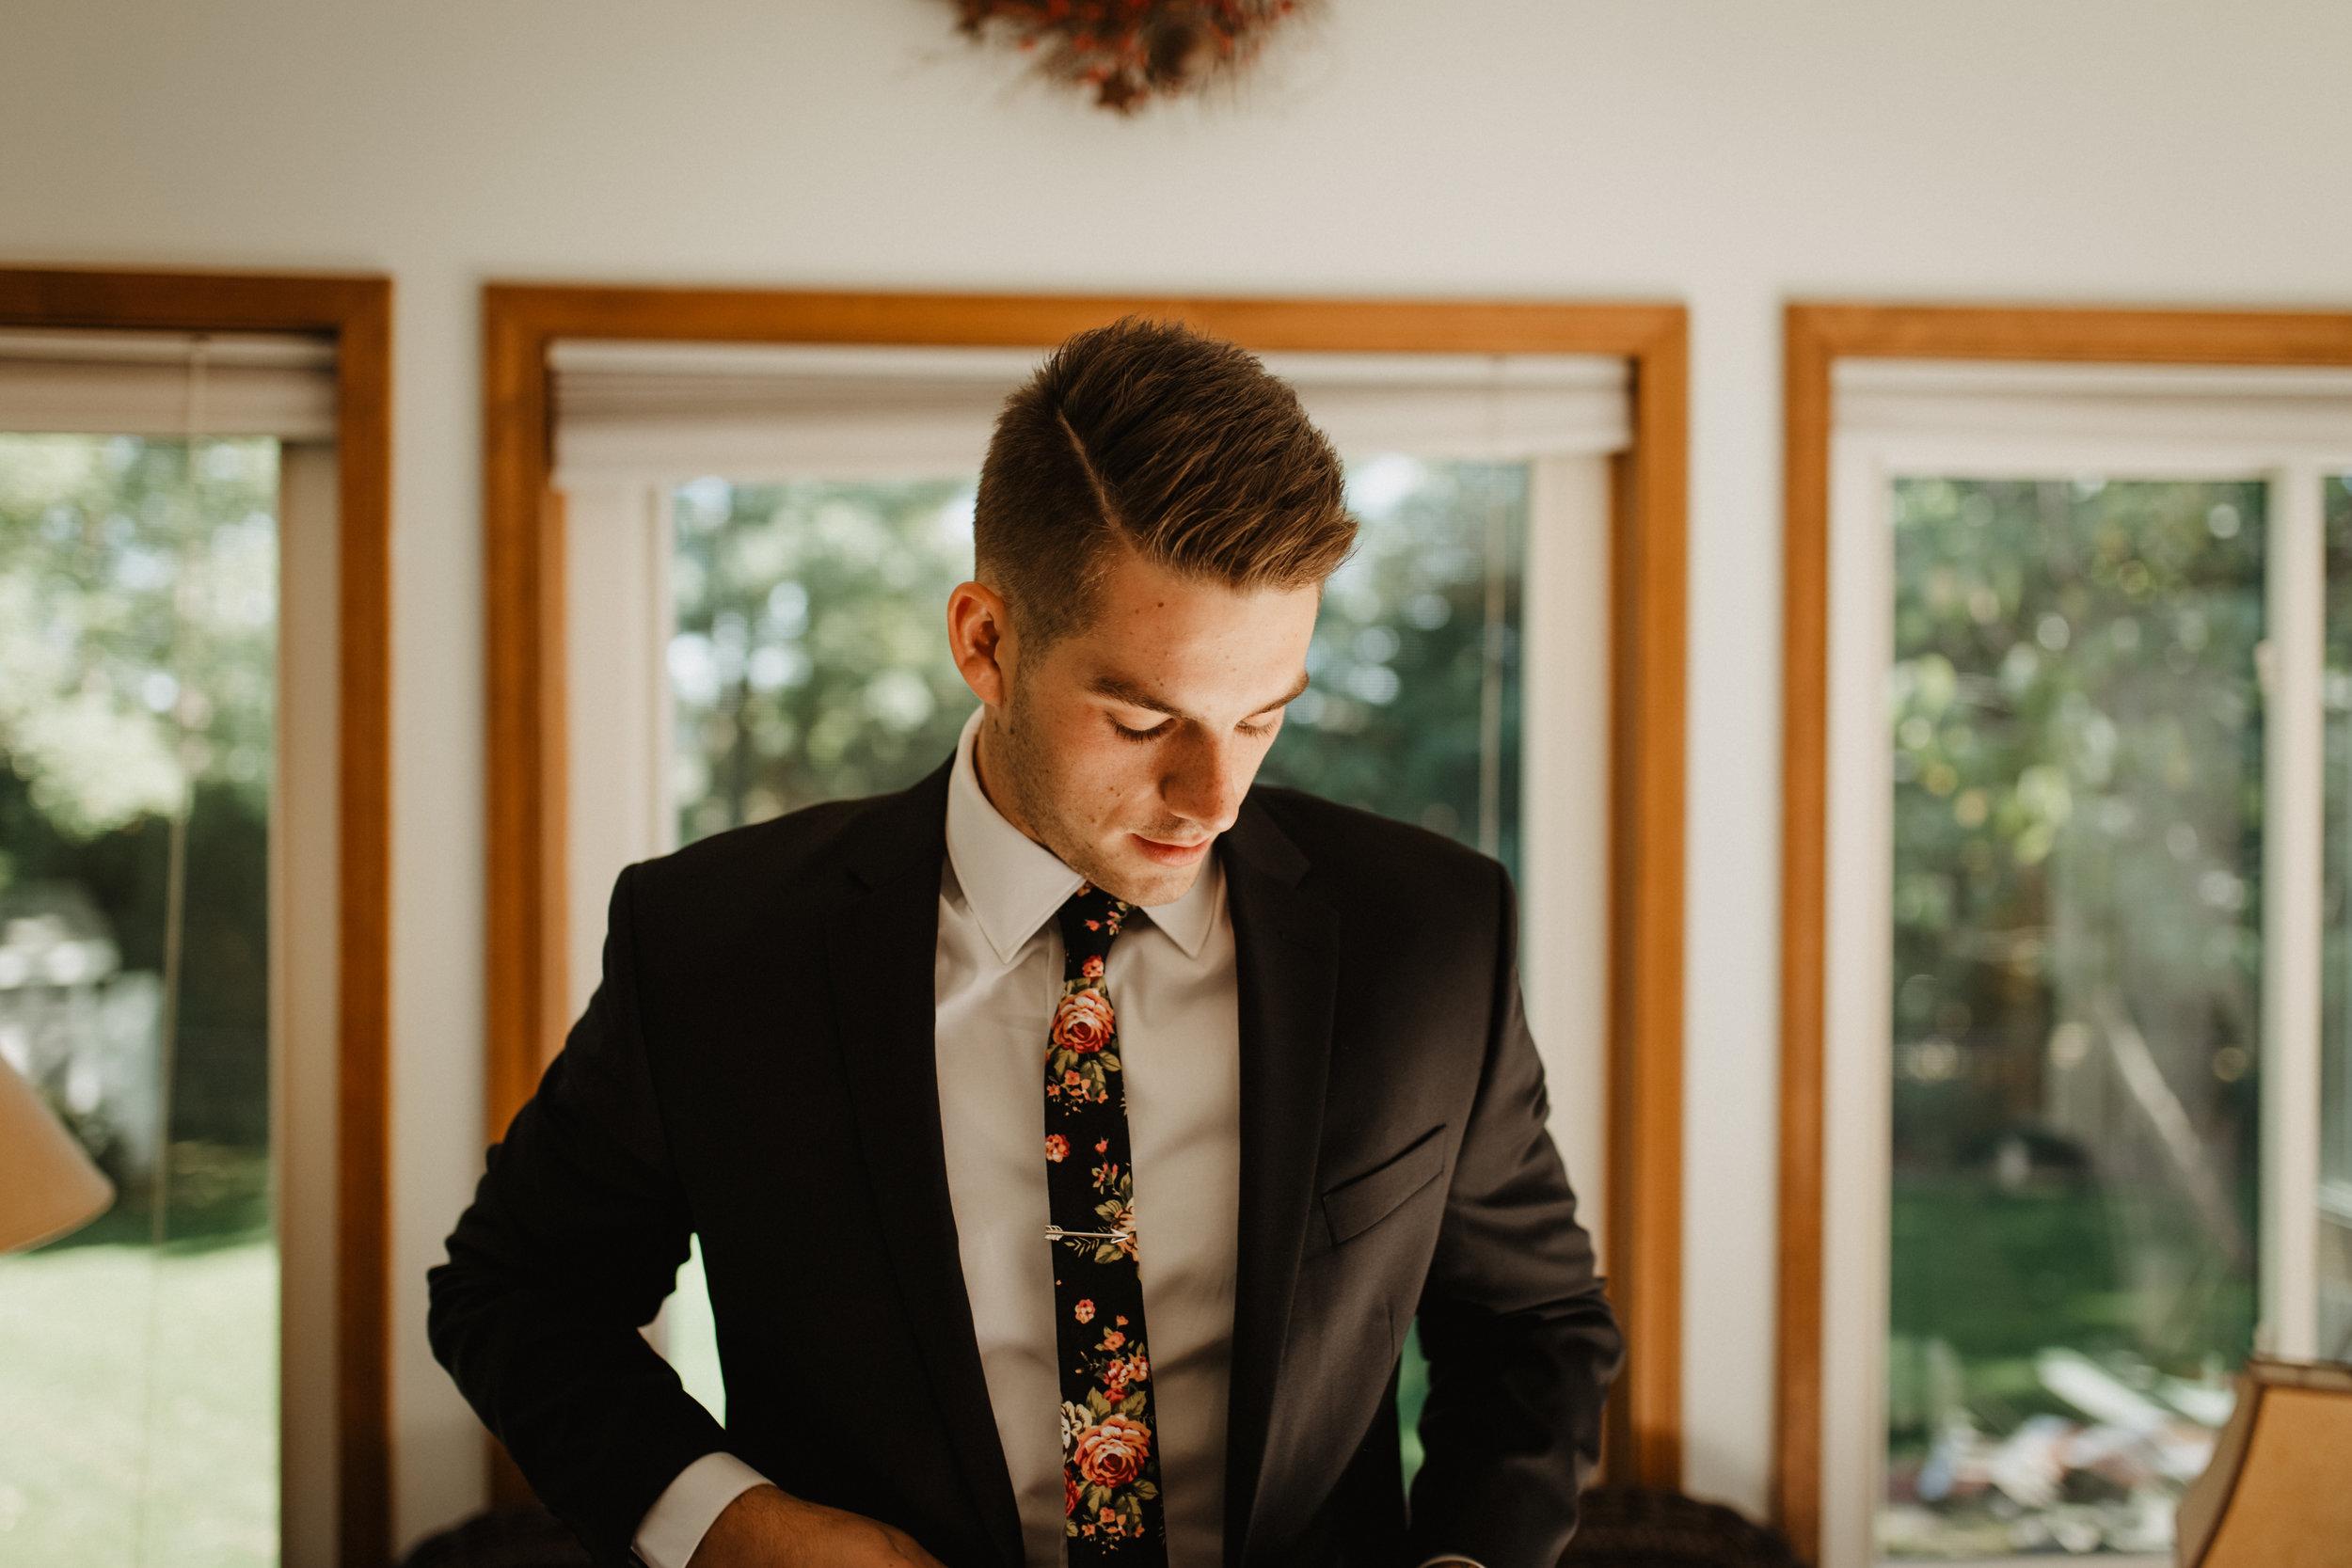 Groom-Wedding-Preparation-04